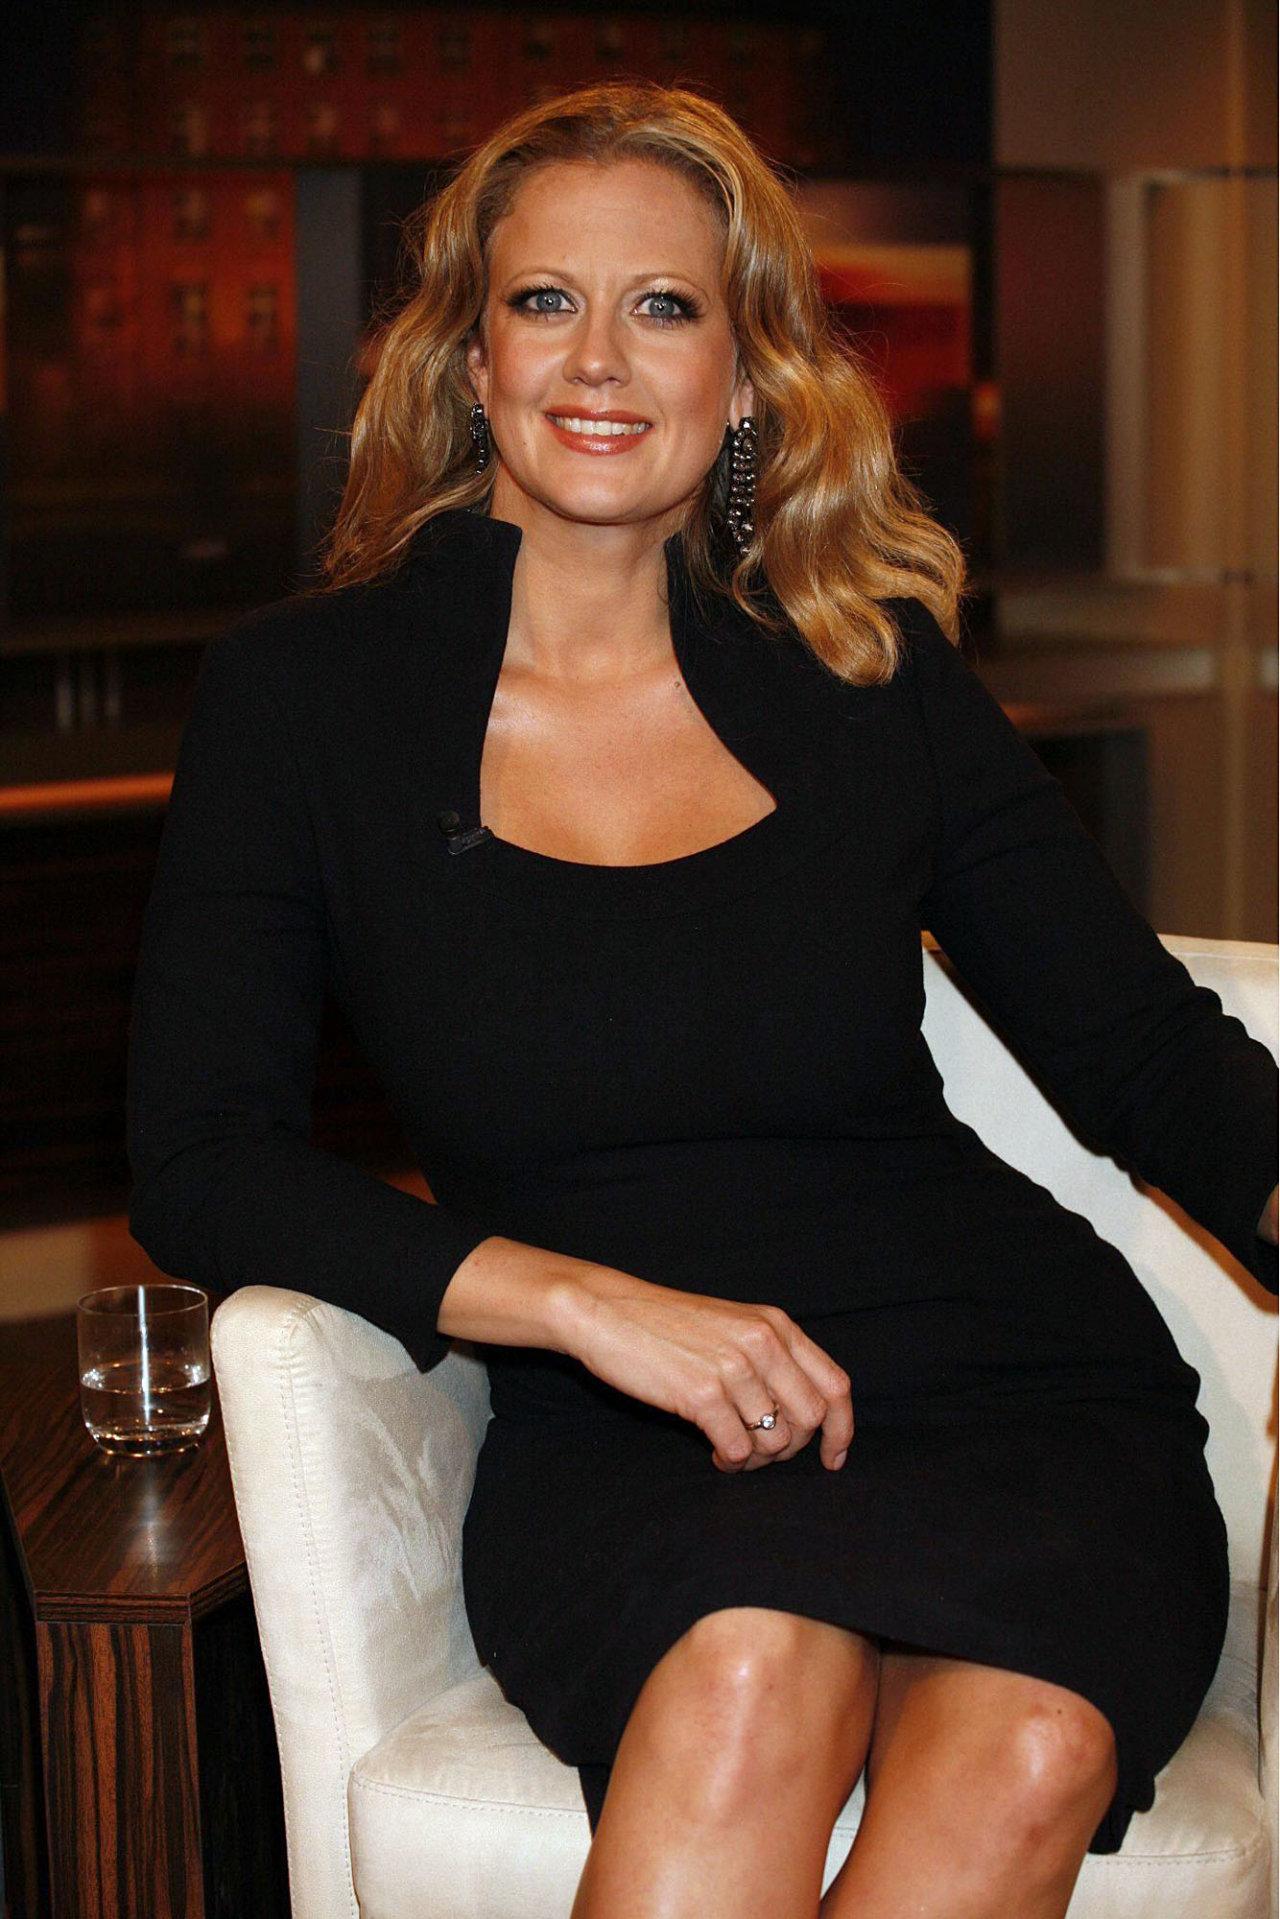 Barbara Schöneberg